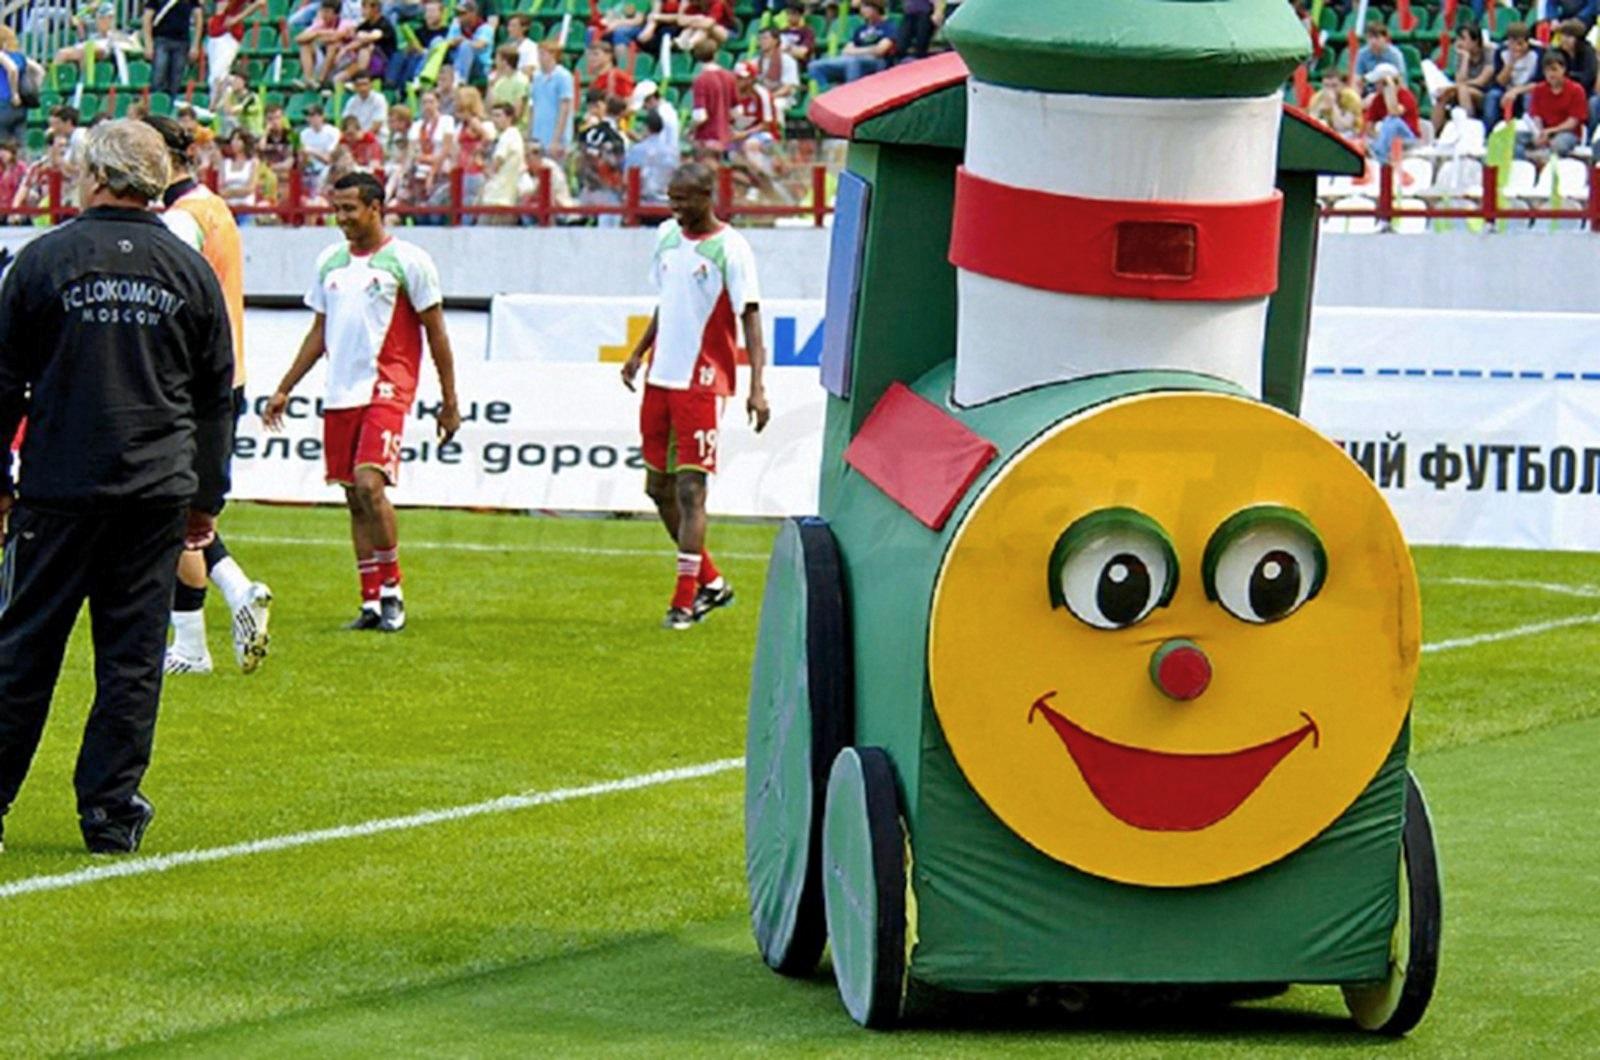 00 FK Lokomotiv mascot on the pitch 221115